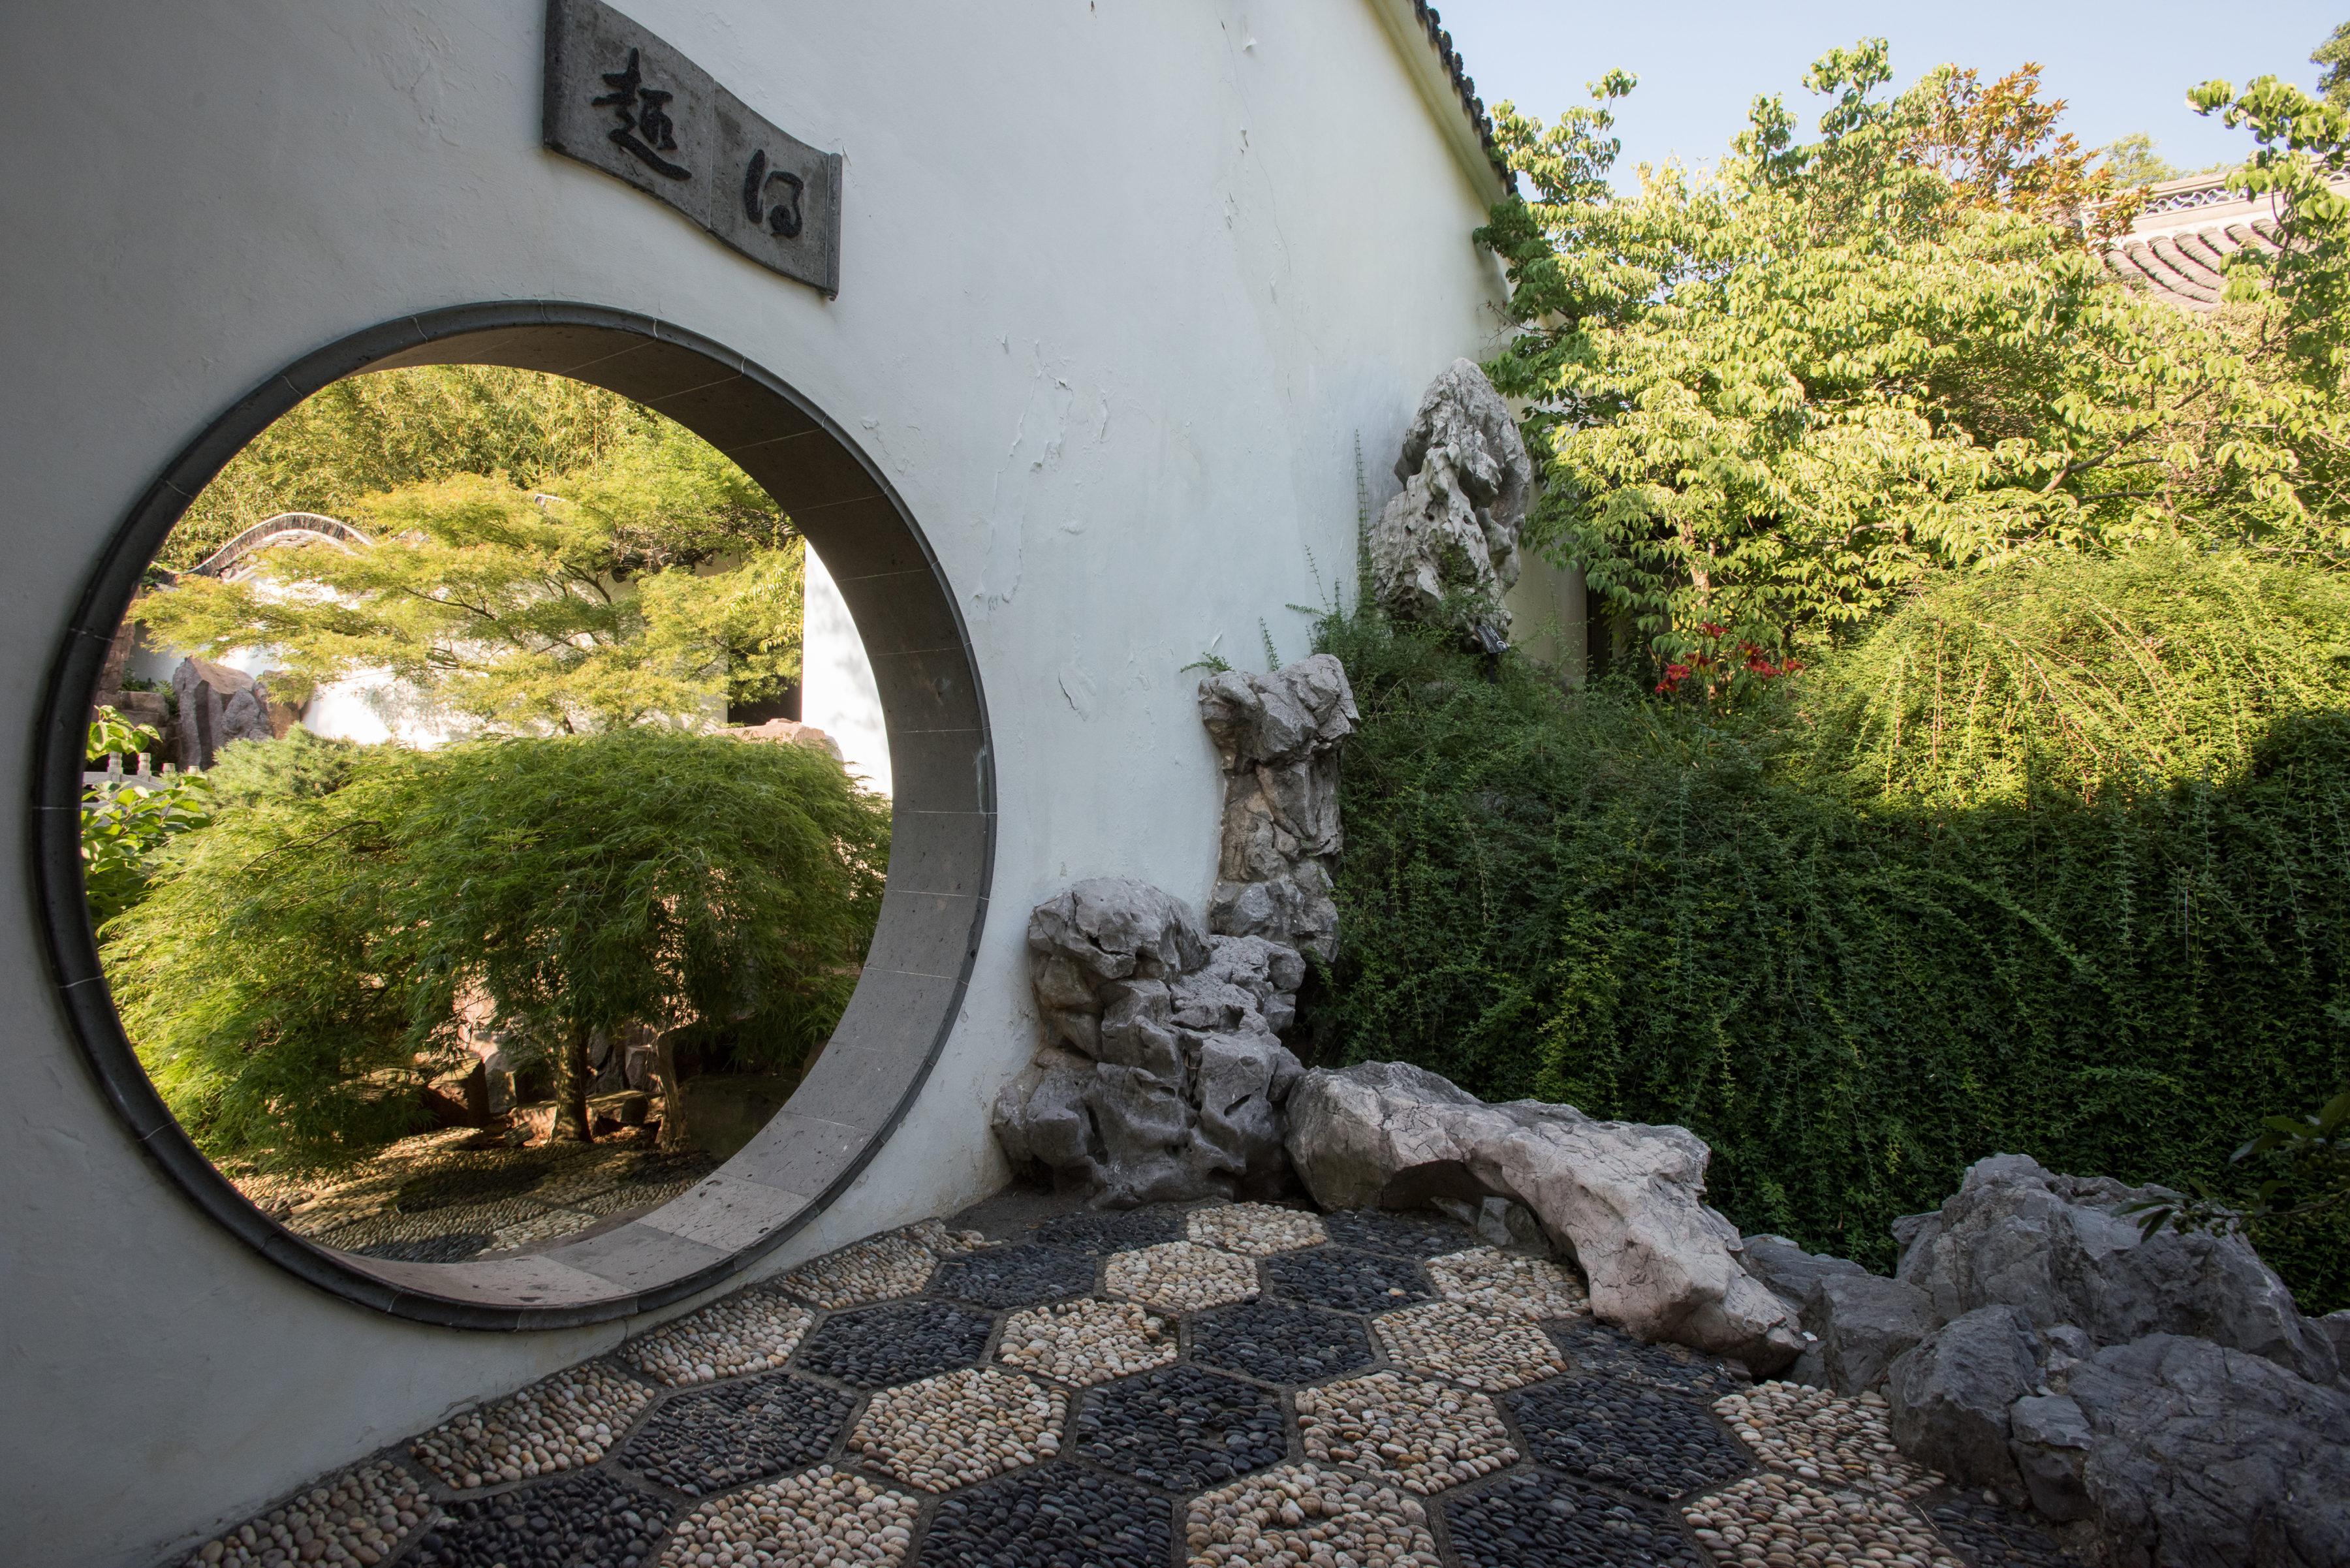 snug harbor cultural center botanical garden - Staten Island Botanical Garden